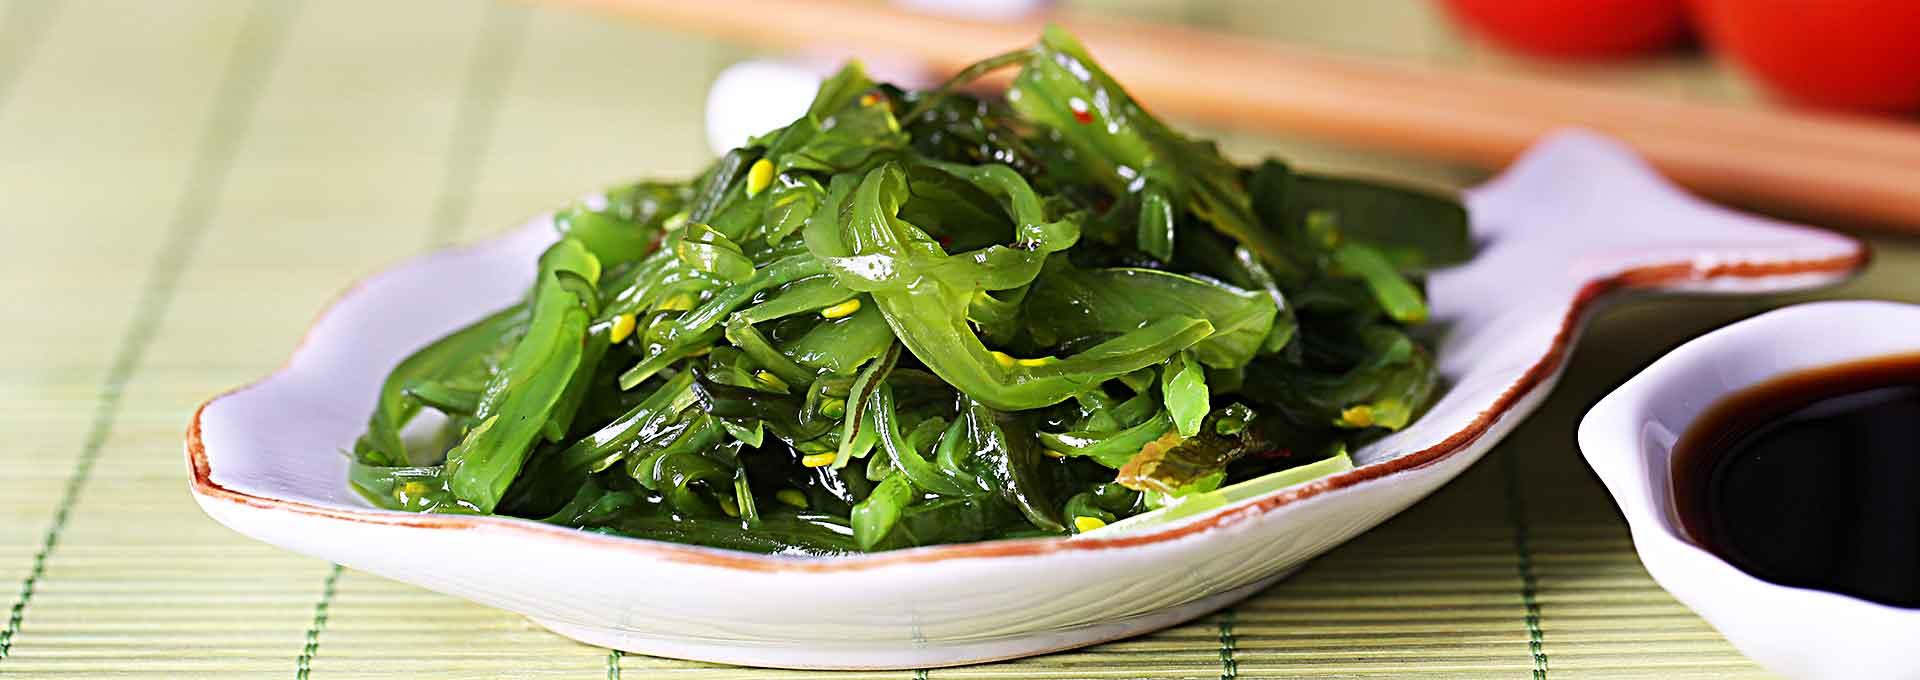 alghe-proprieta-e-utilizzo-in-cucina